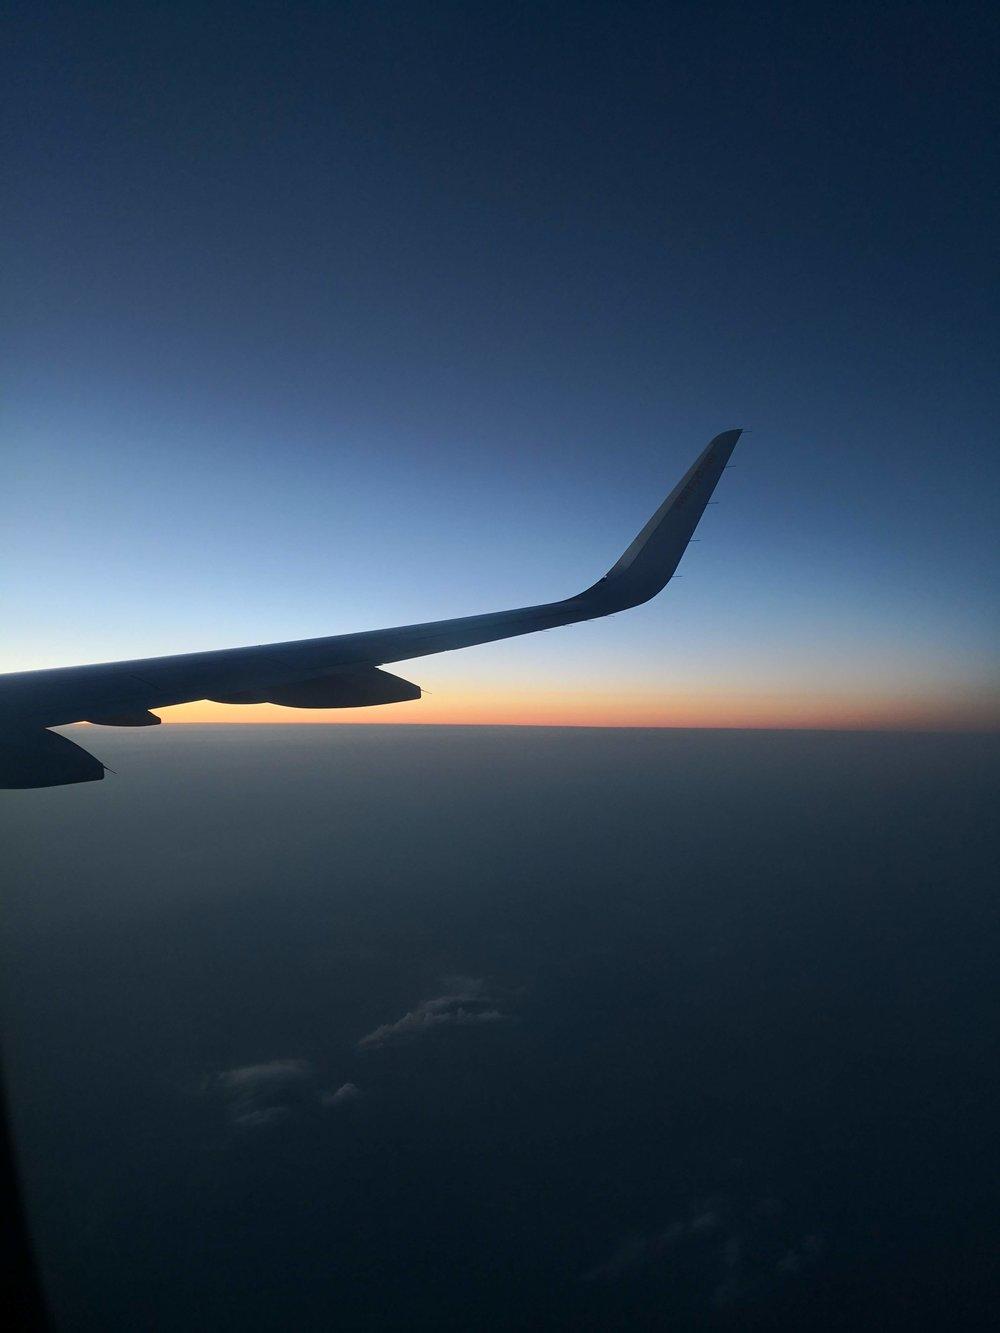 Flying over Alaska at 11.30pm